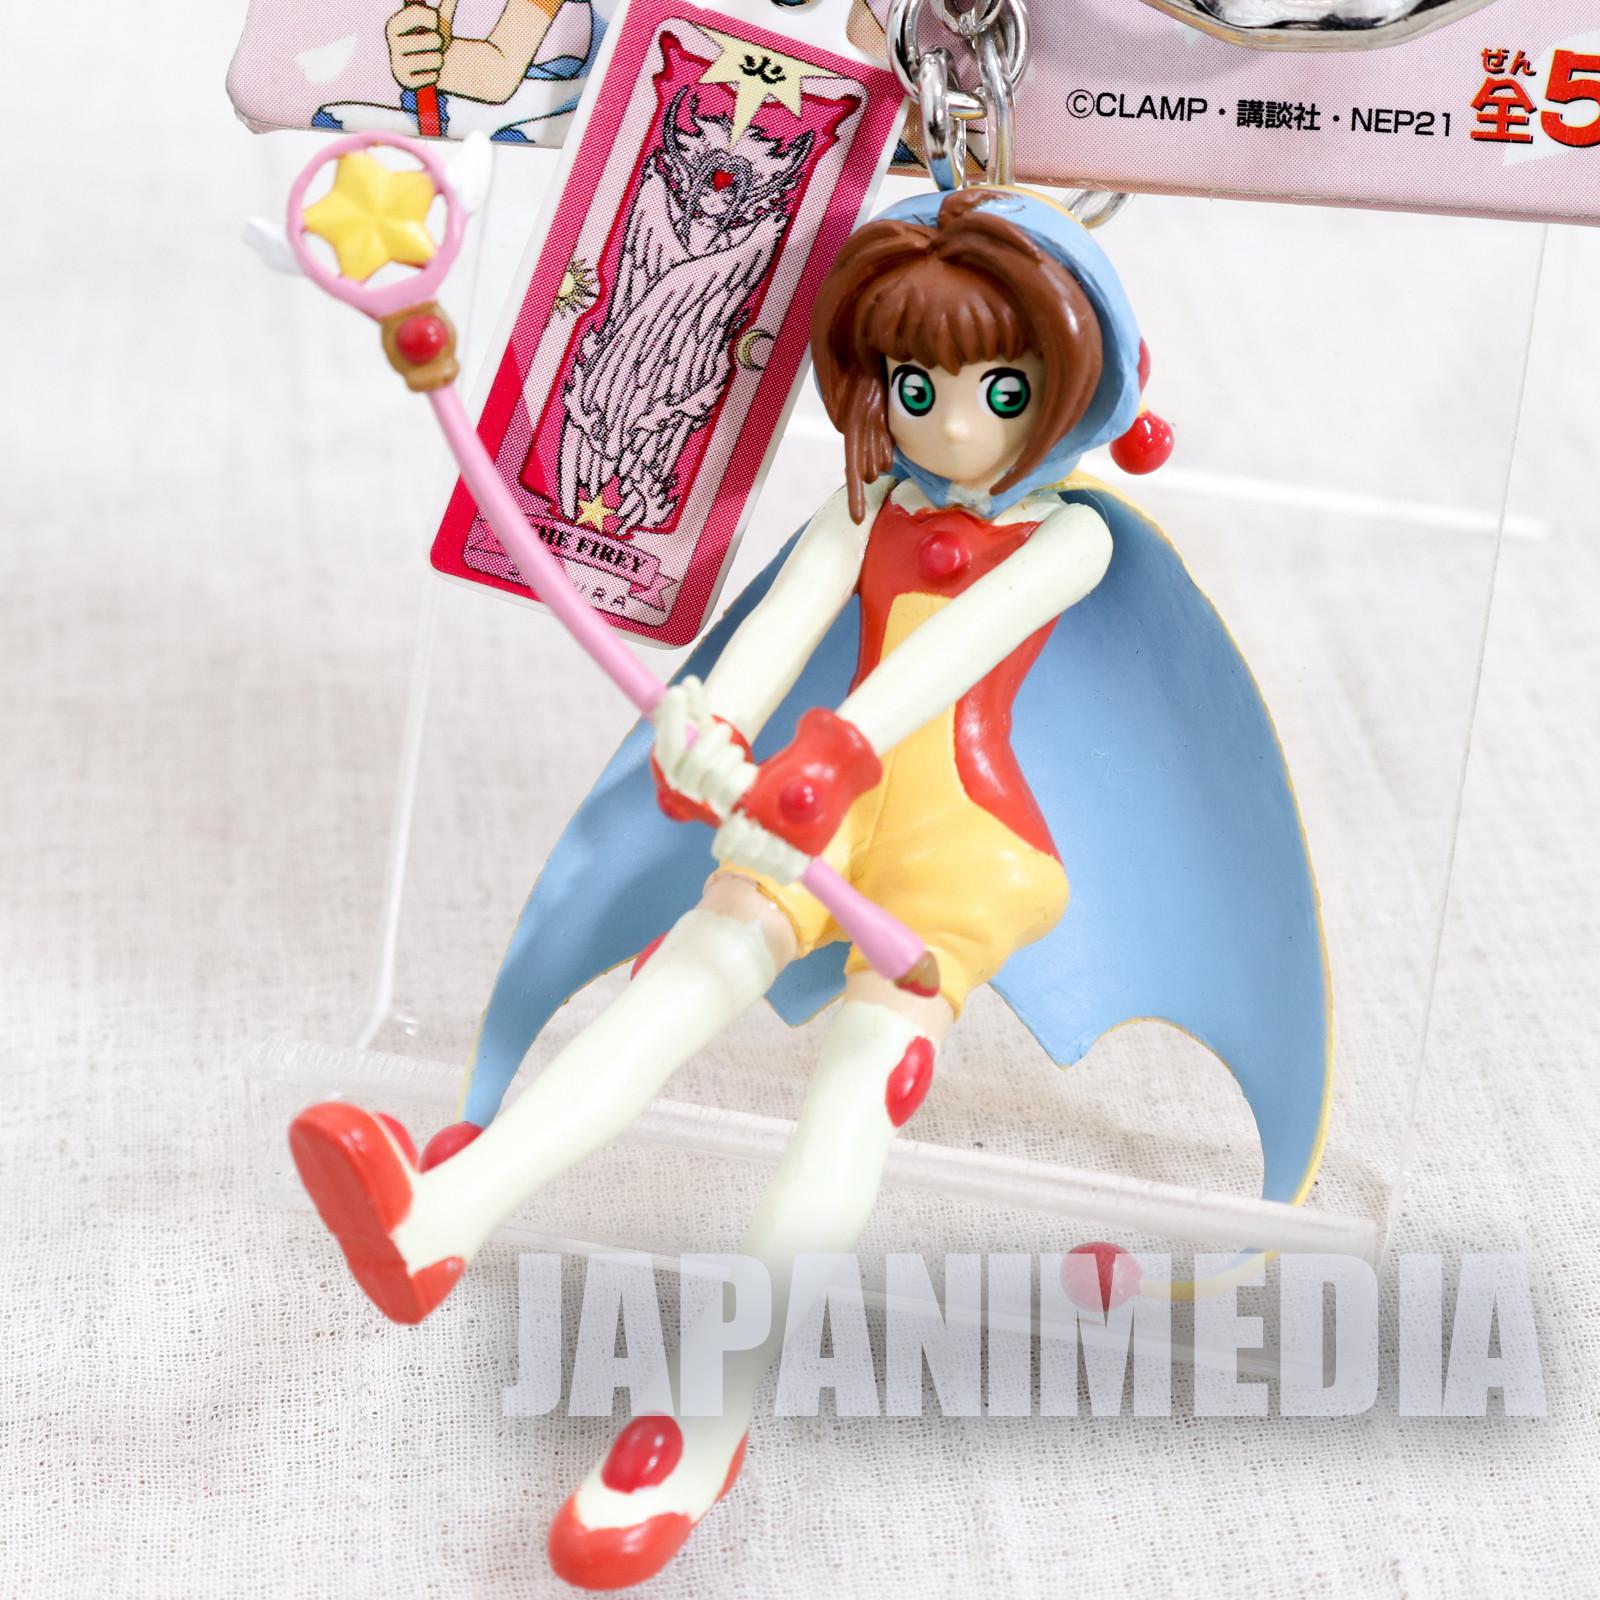 Cardcaptor Sakura Figure Keychain Battle Uniform Ver. 1 JAPAN ANIME MANGA CLAMP